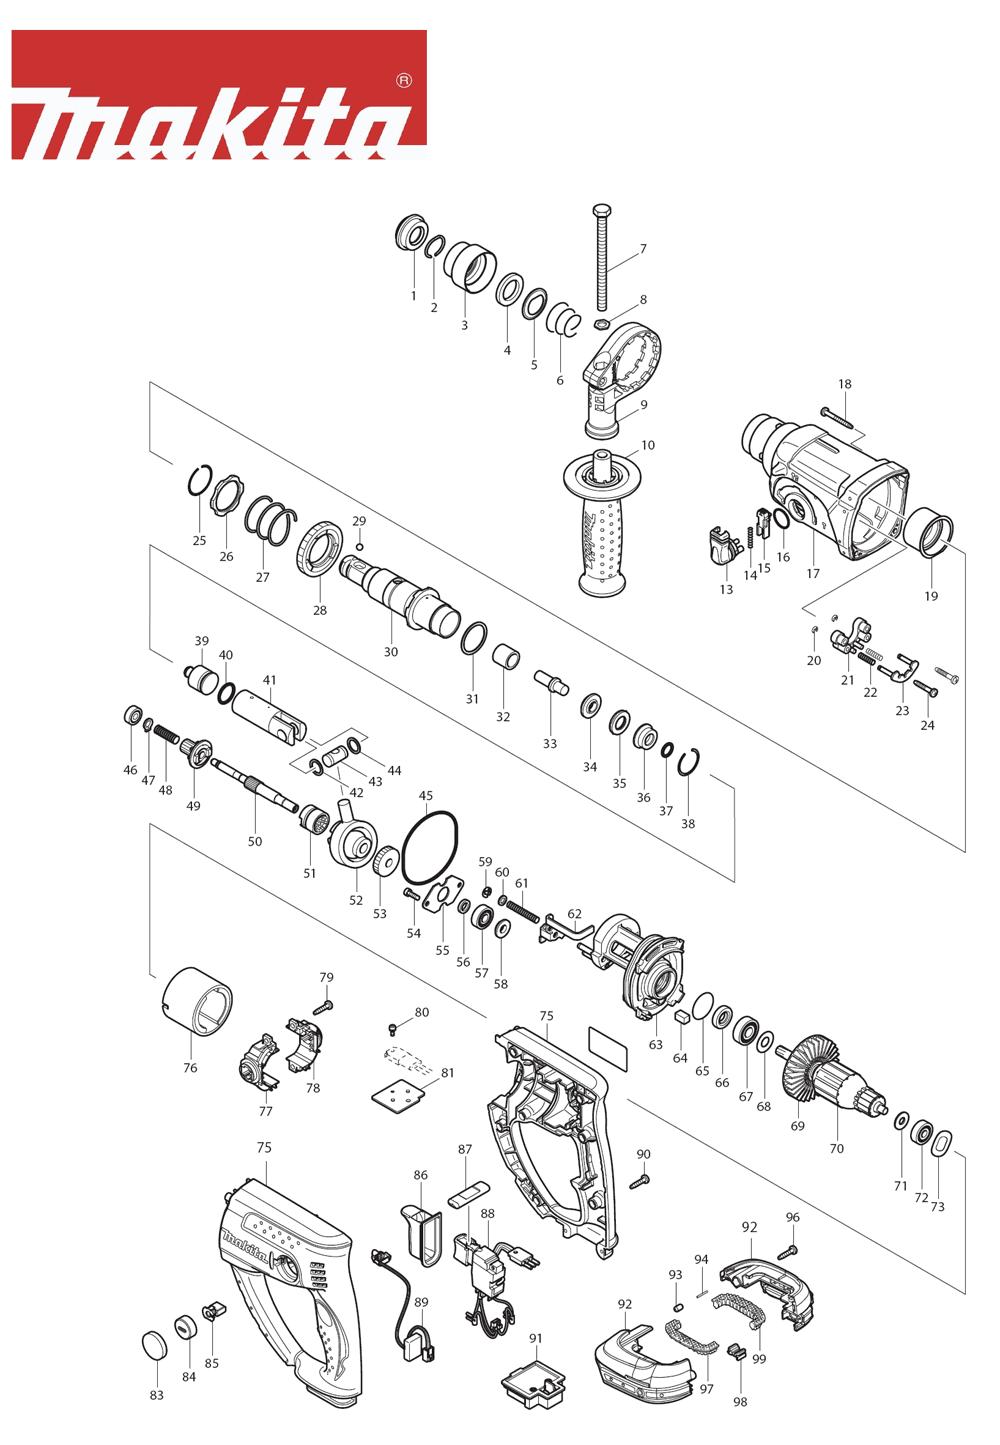 Makita BHR202F-Type-3 Parts List | Makita BHR202F-Type-3 ... on